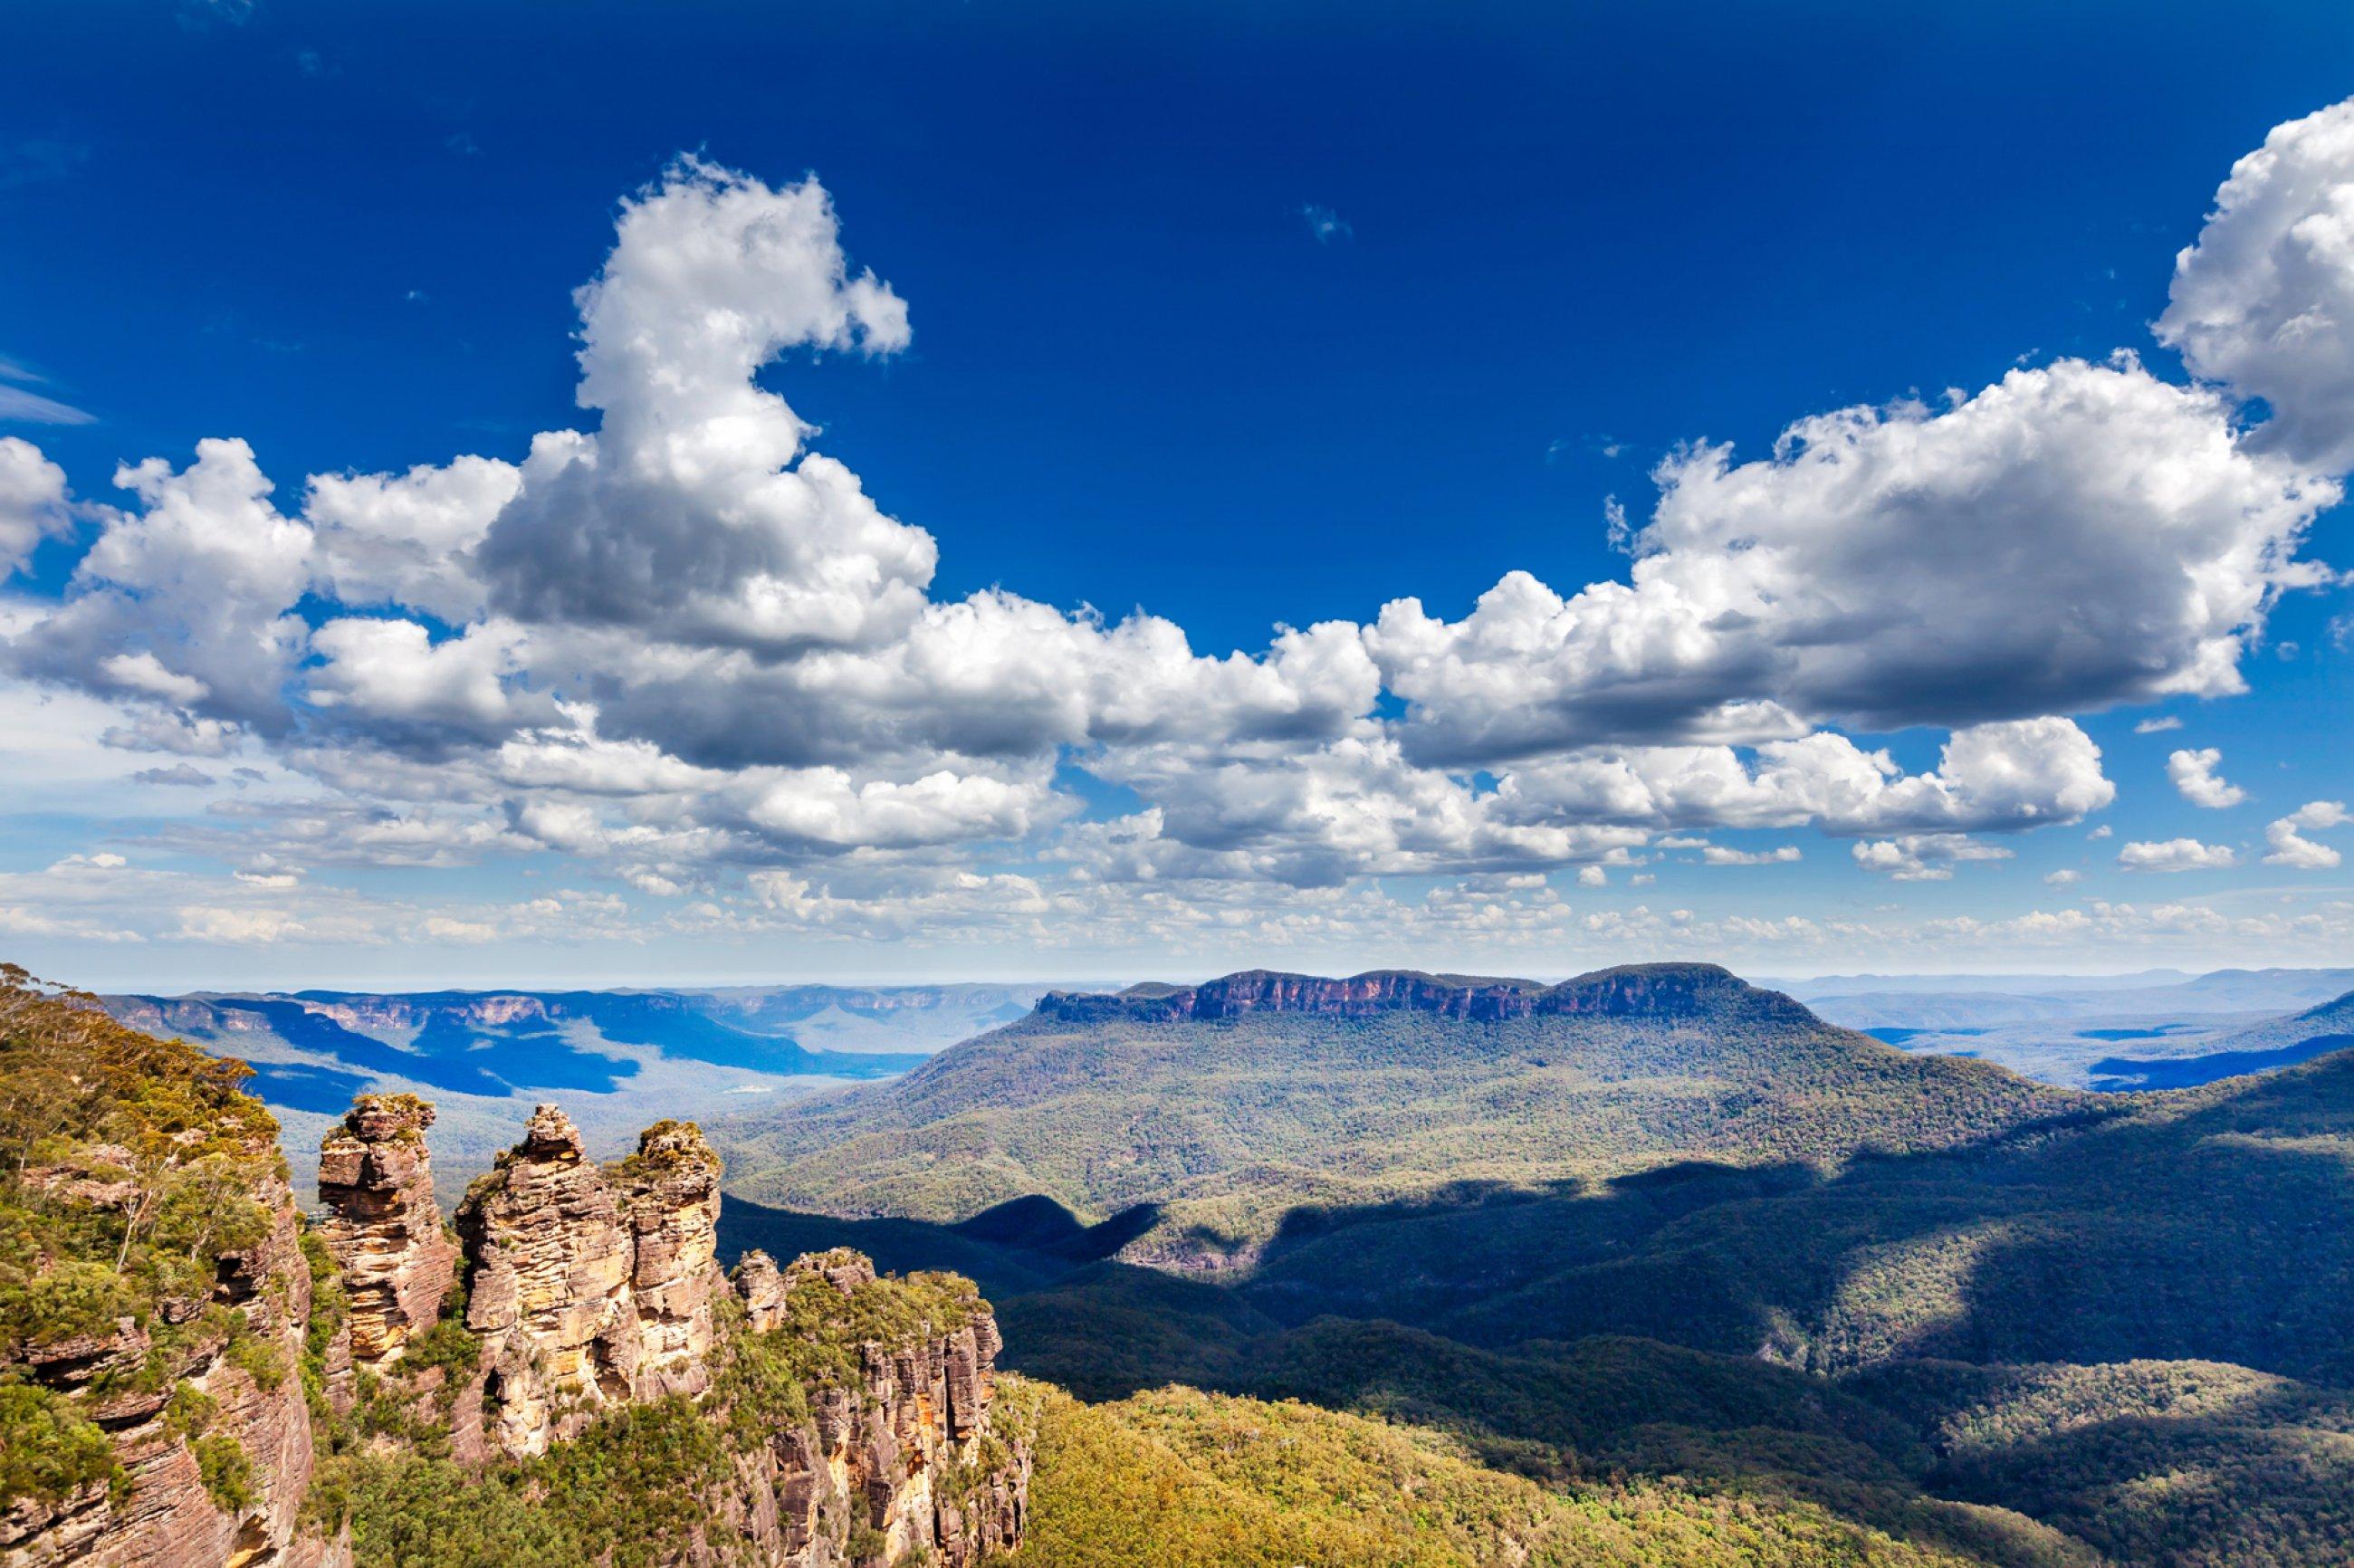 https://bubo.sk/uploads/galleries/5031/blue-mountains-shutterstock-184967273-2-.jpg